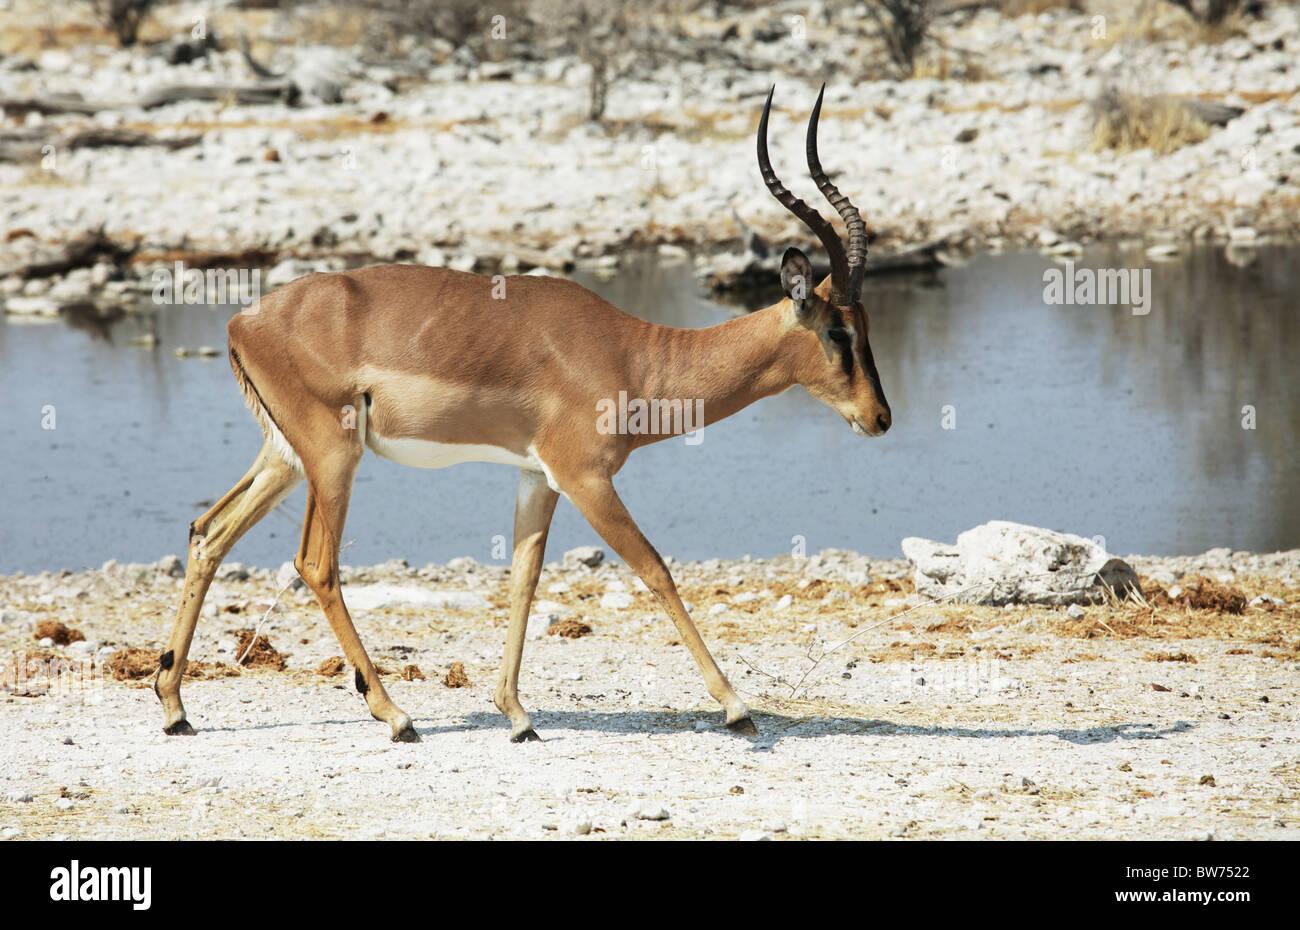 Antelope on waterhole - Stock Image